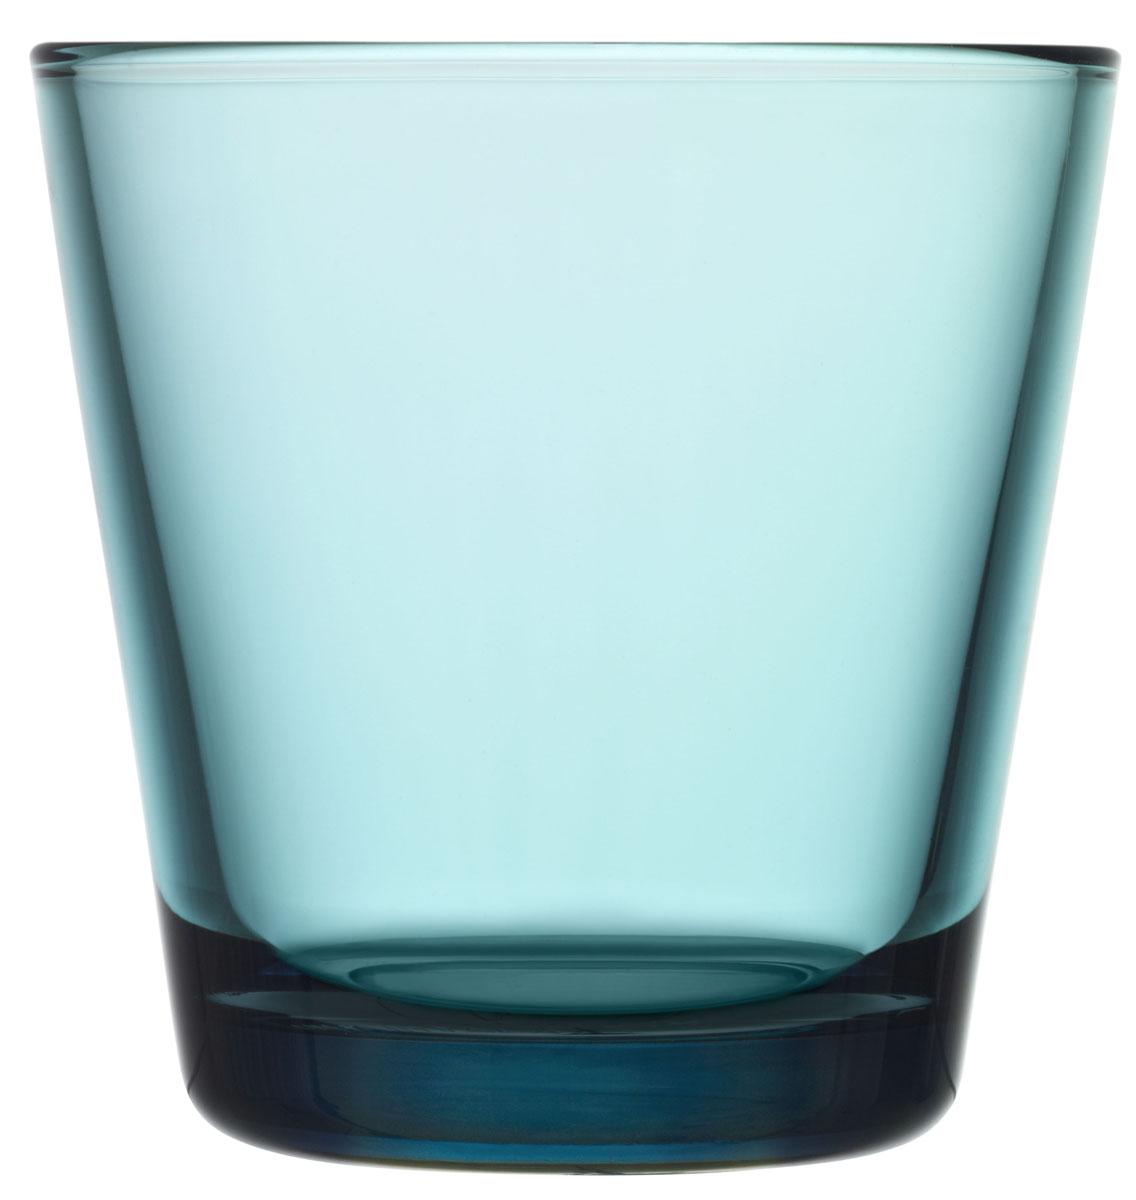 Стакан Iittala Kartio, цвет: бирюзовый, 210 мл, 2 шт1008574